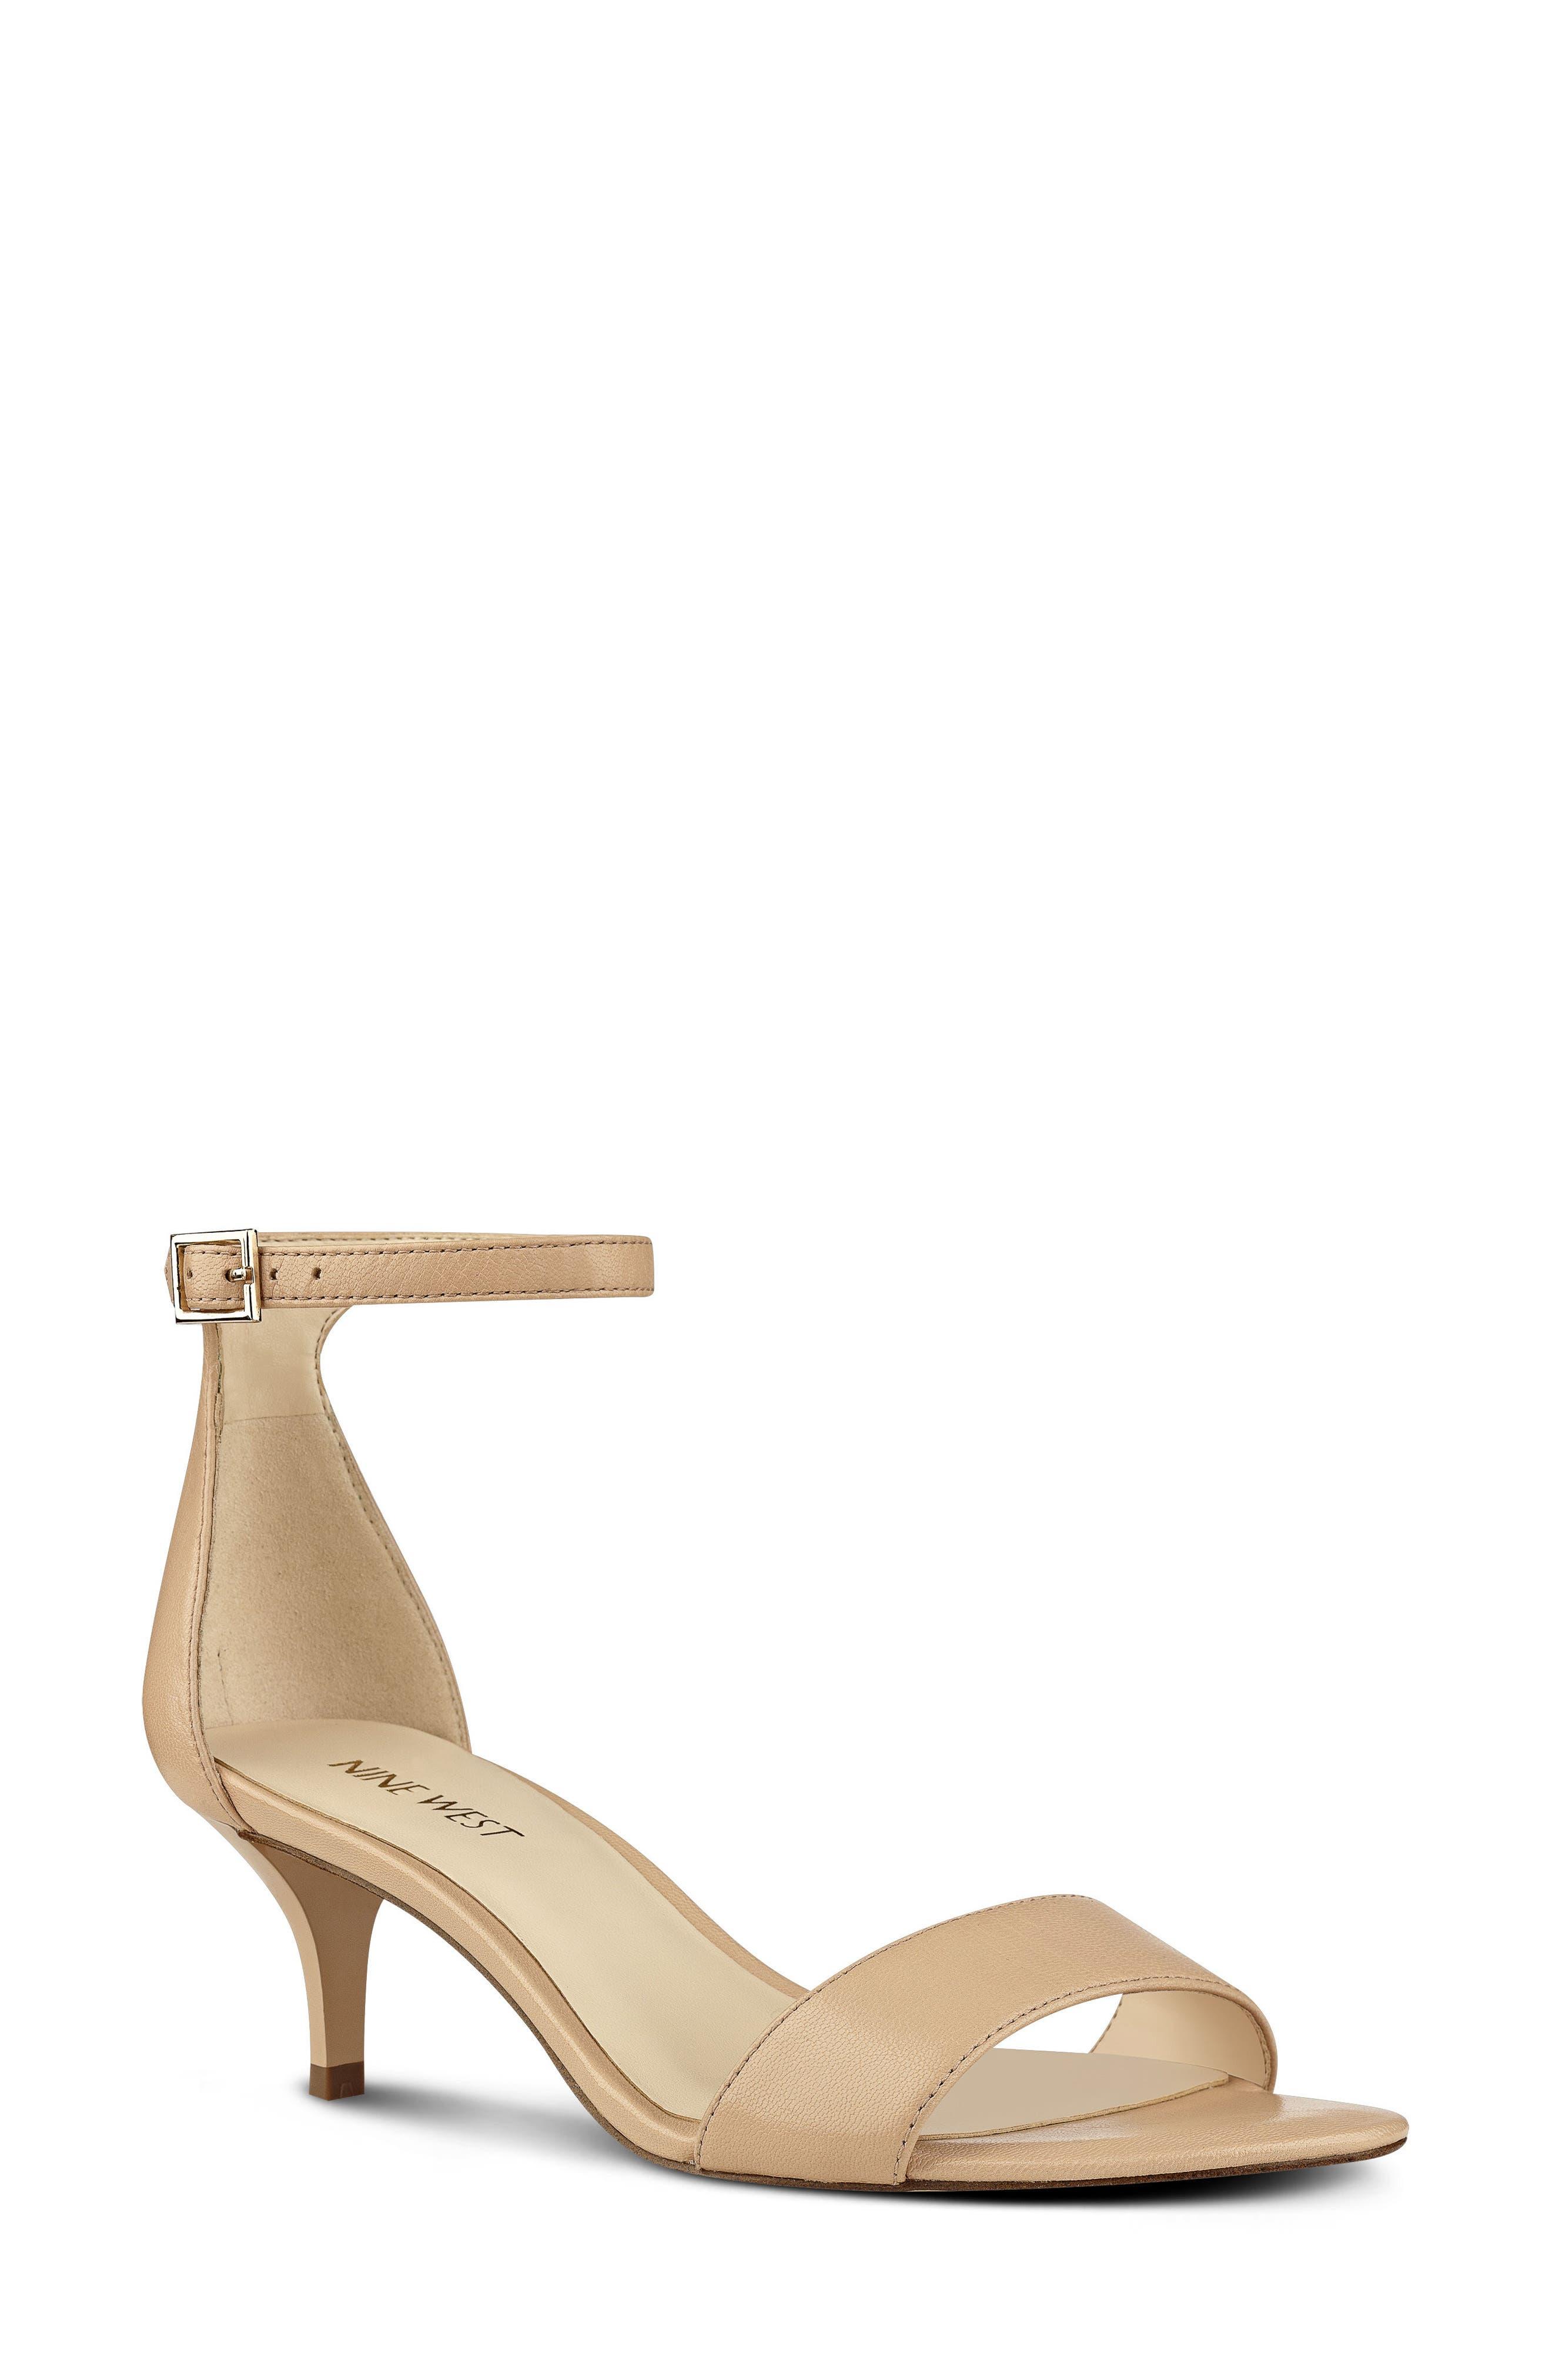 17270eae6ae Nine West Sandals - Women s